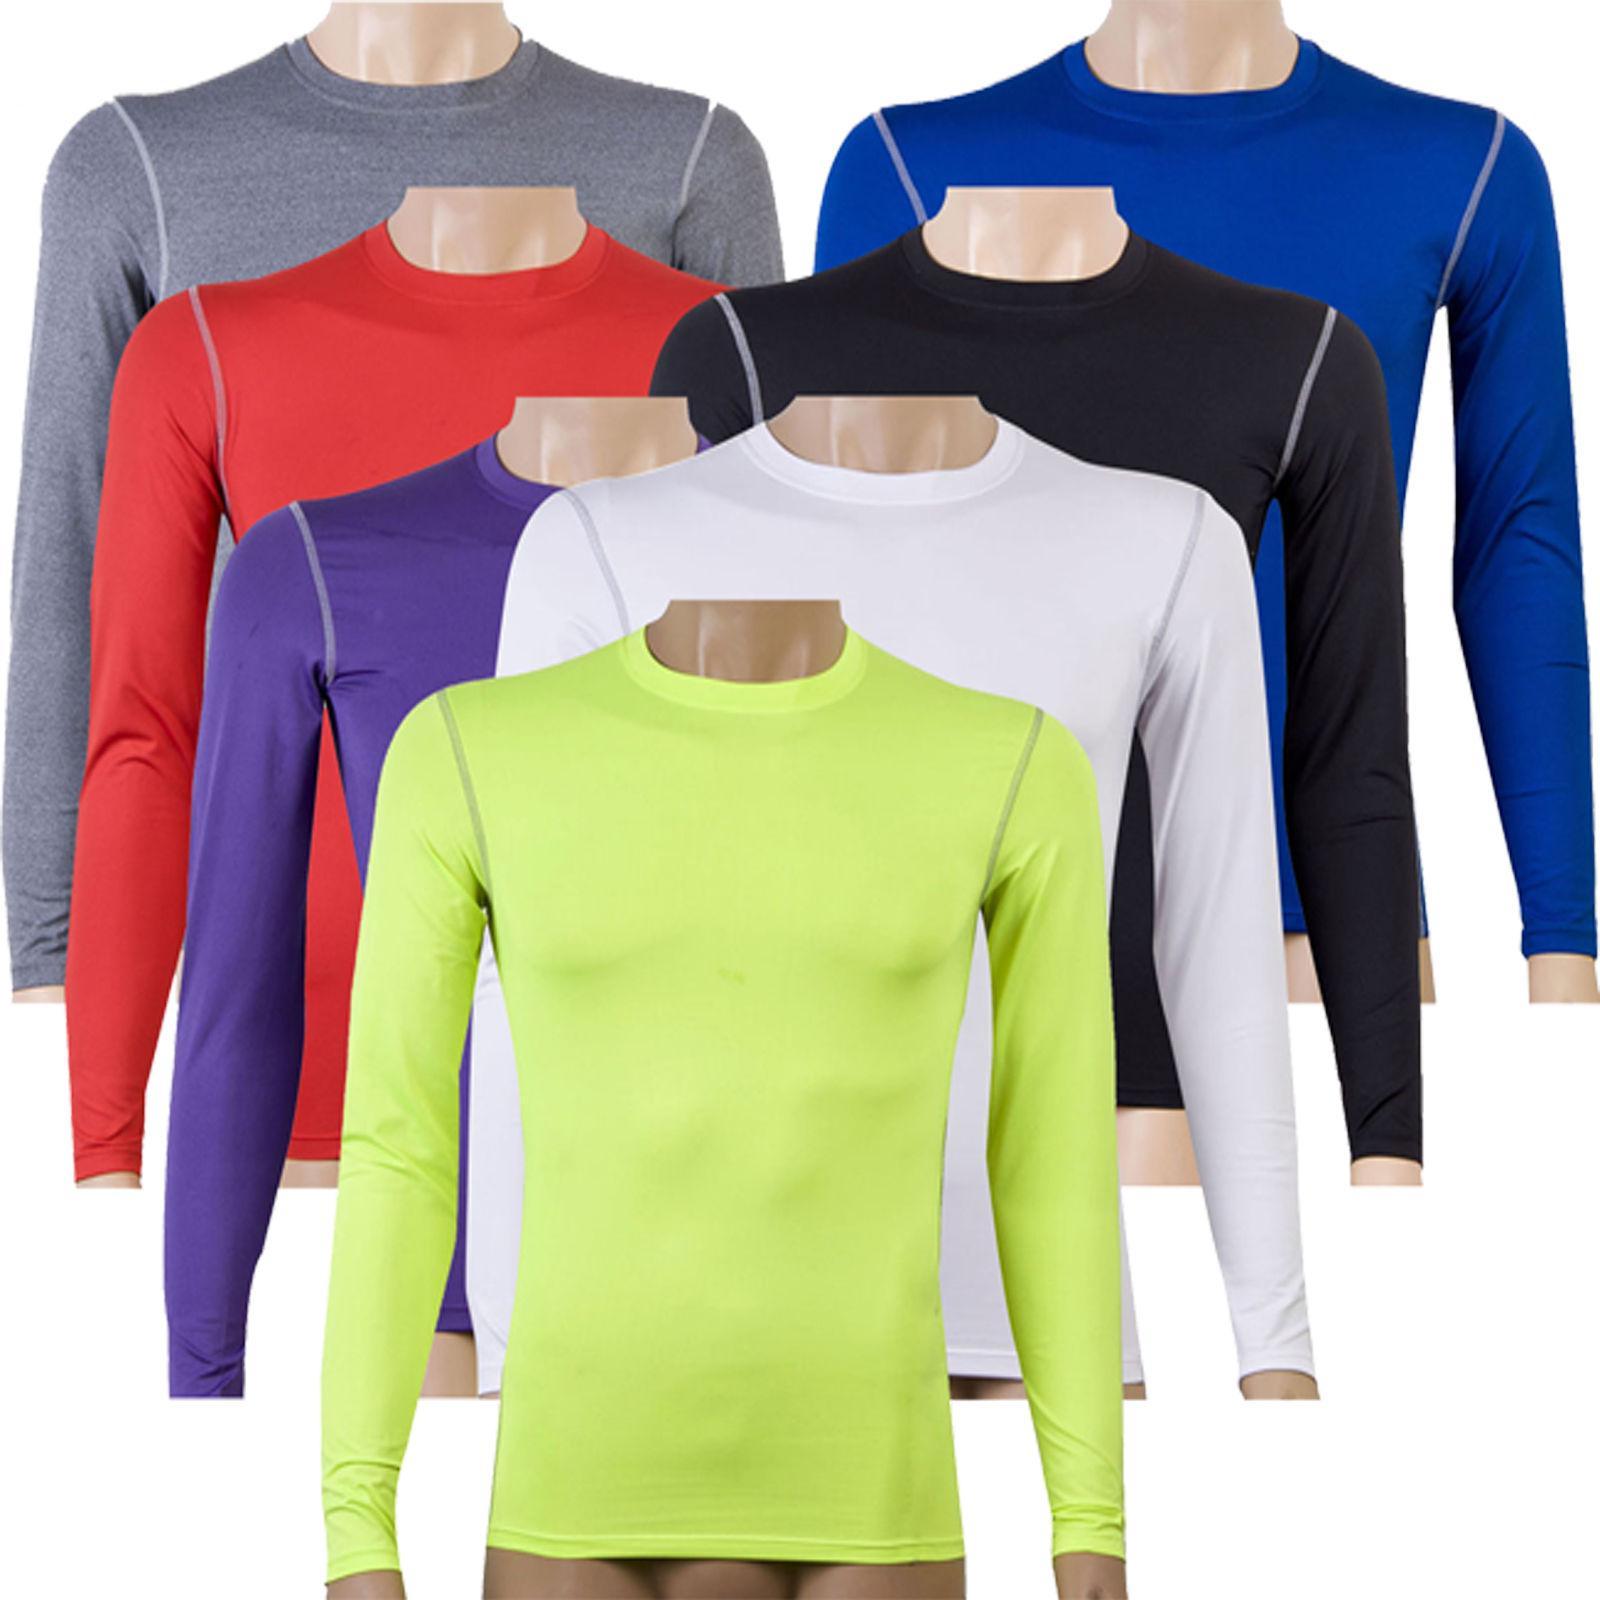 Men Long Sleeve T-Shirt Thermal